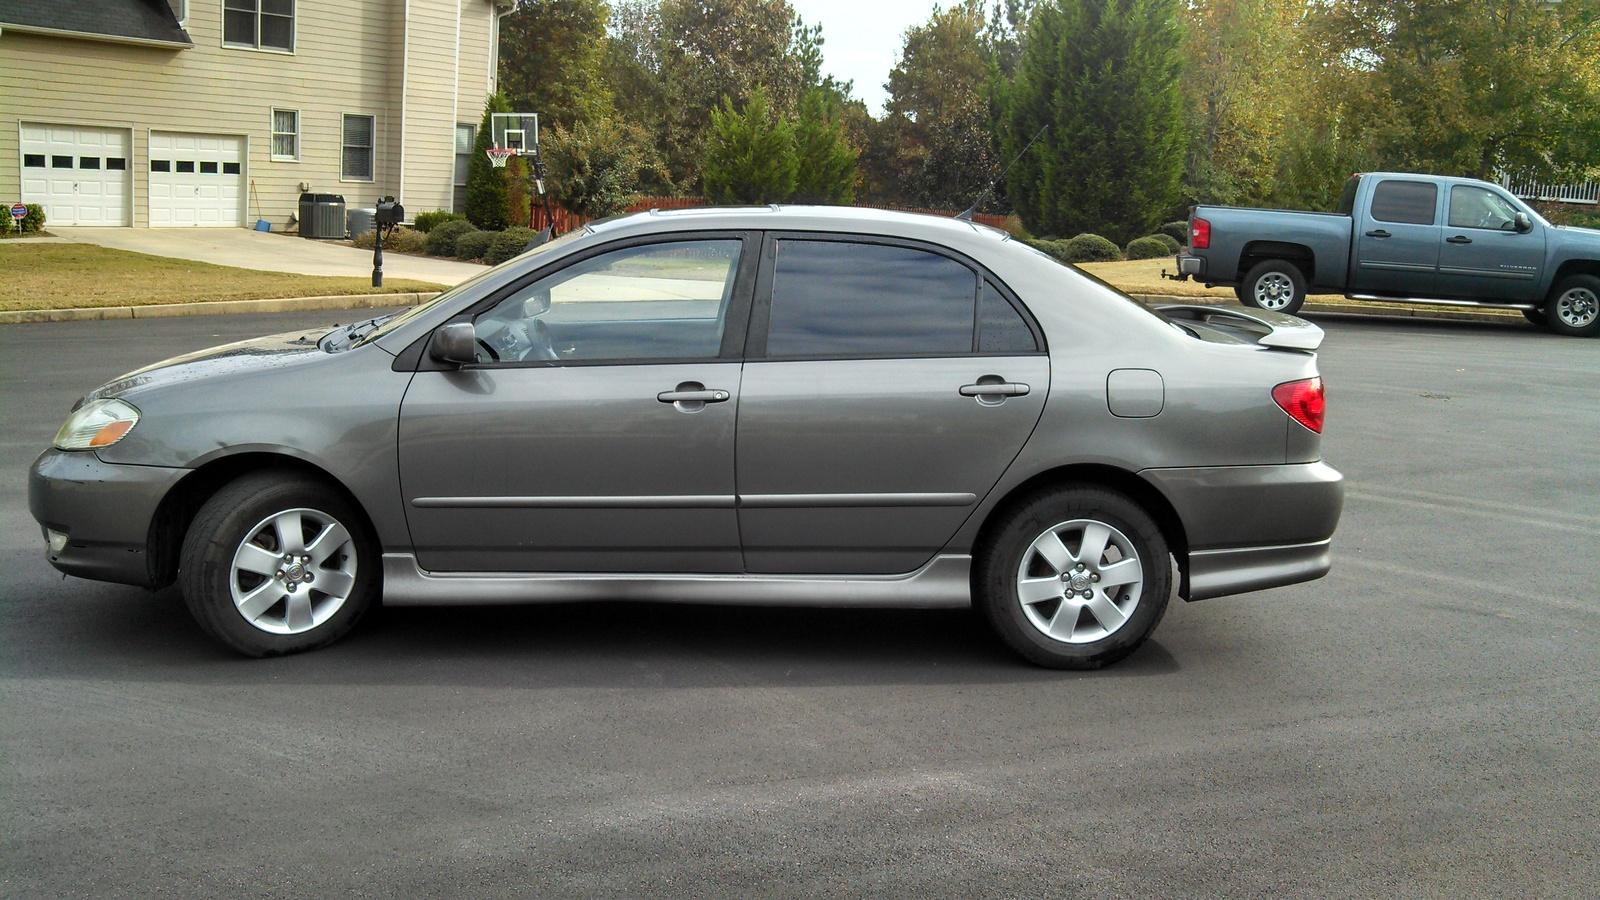 2004 Toyota Corolla - image details